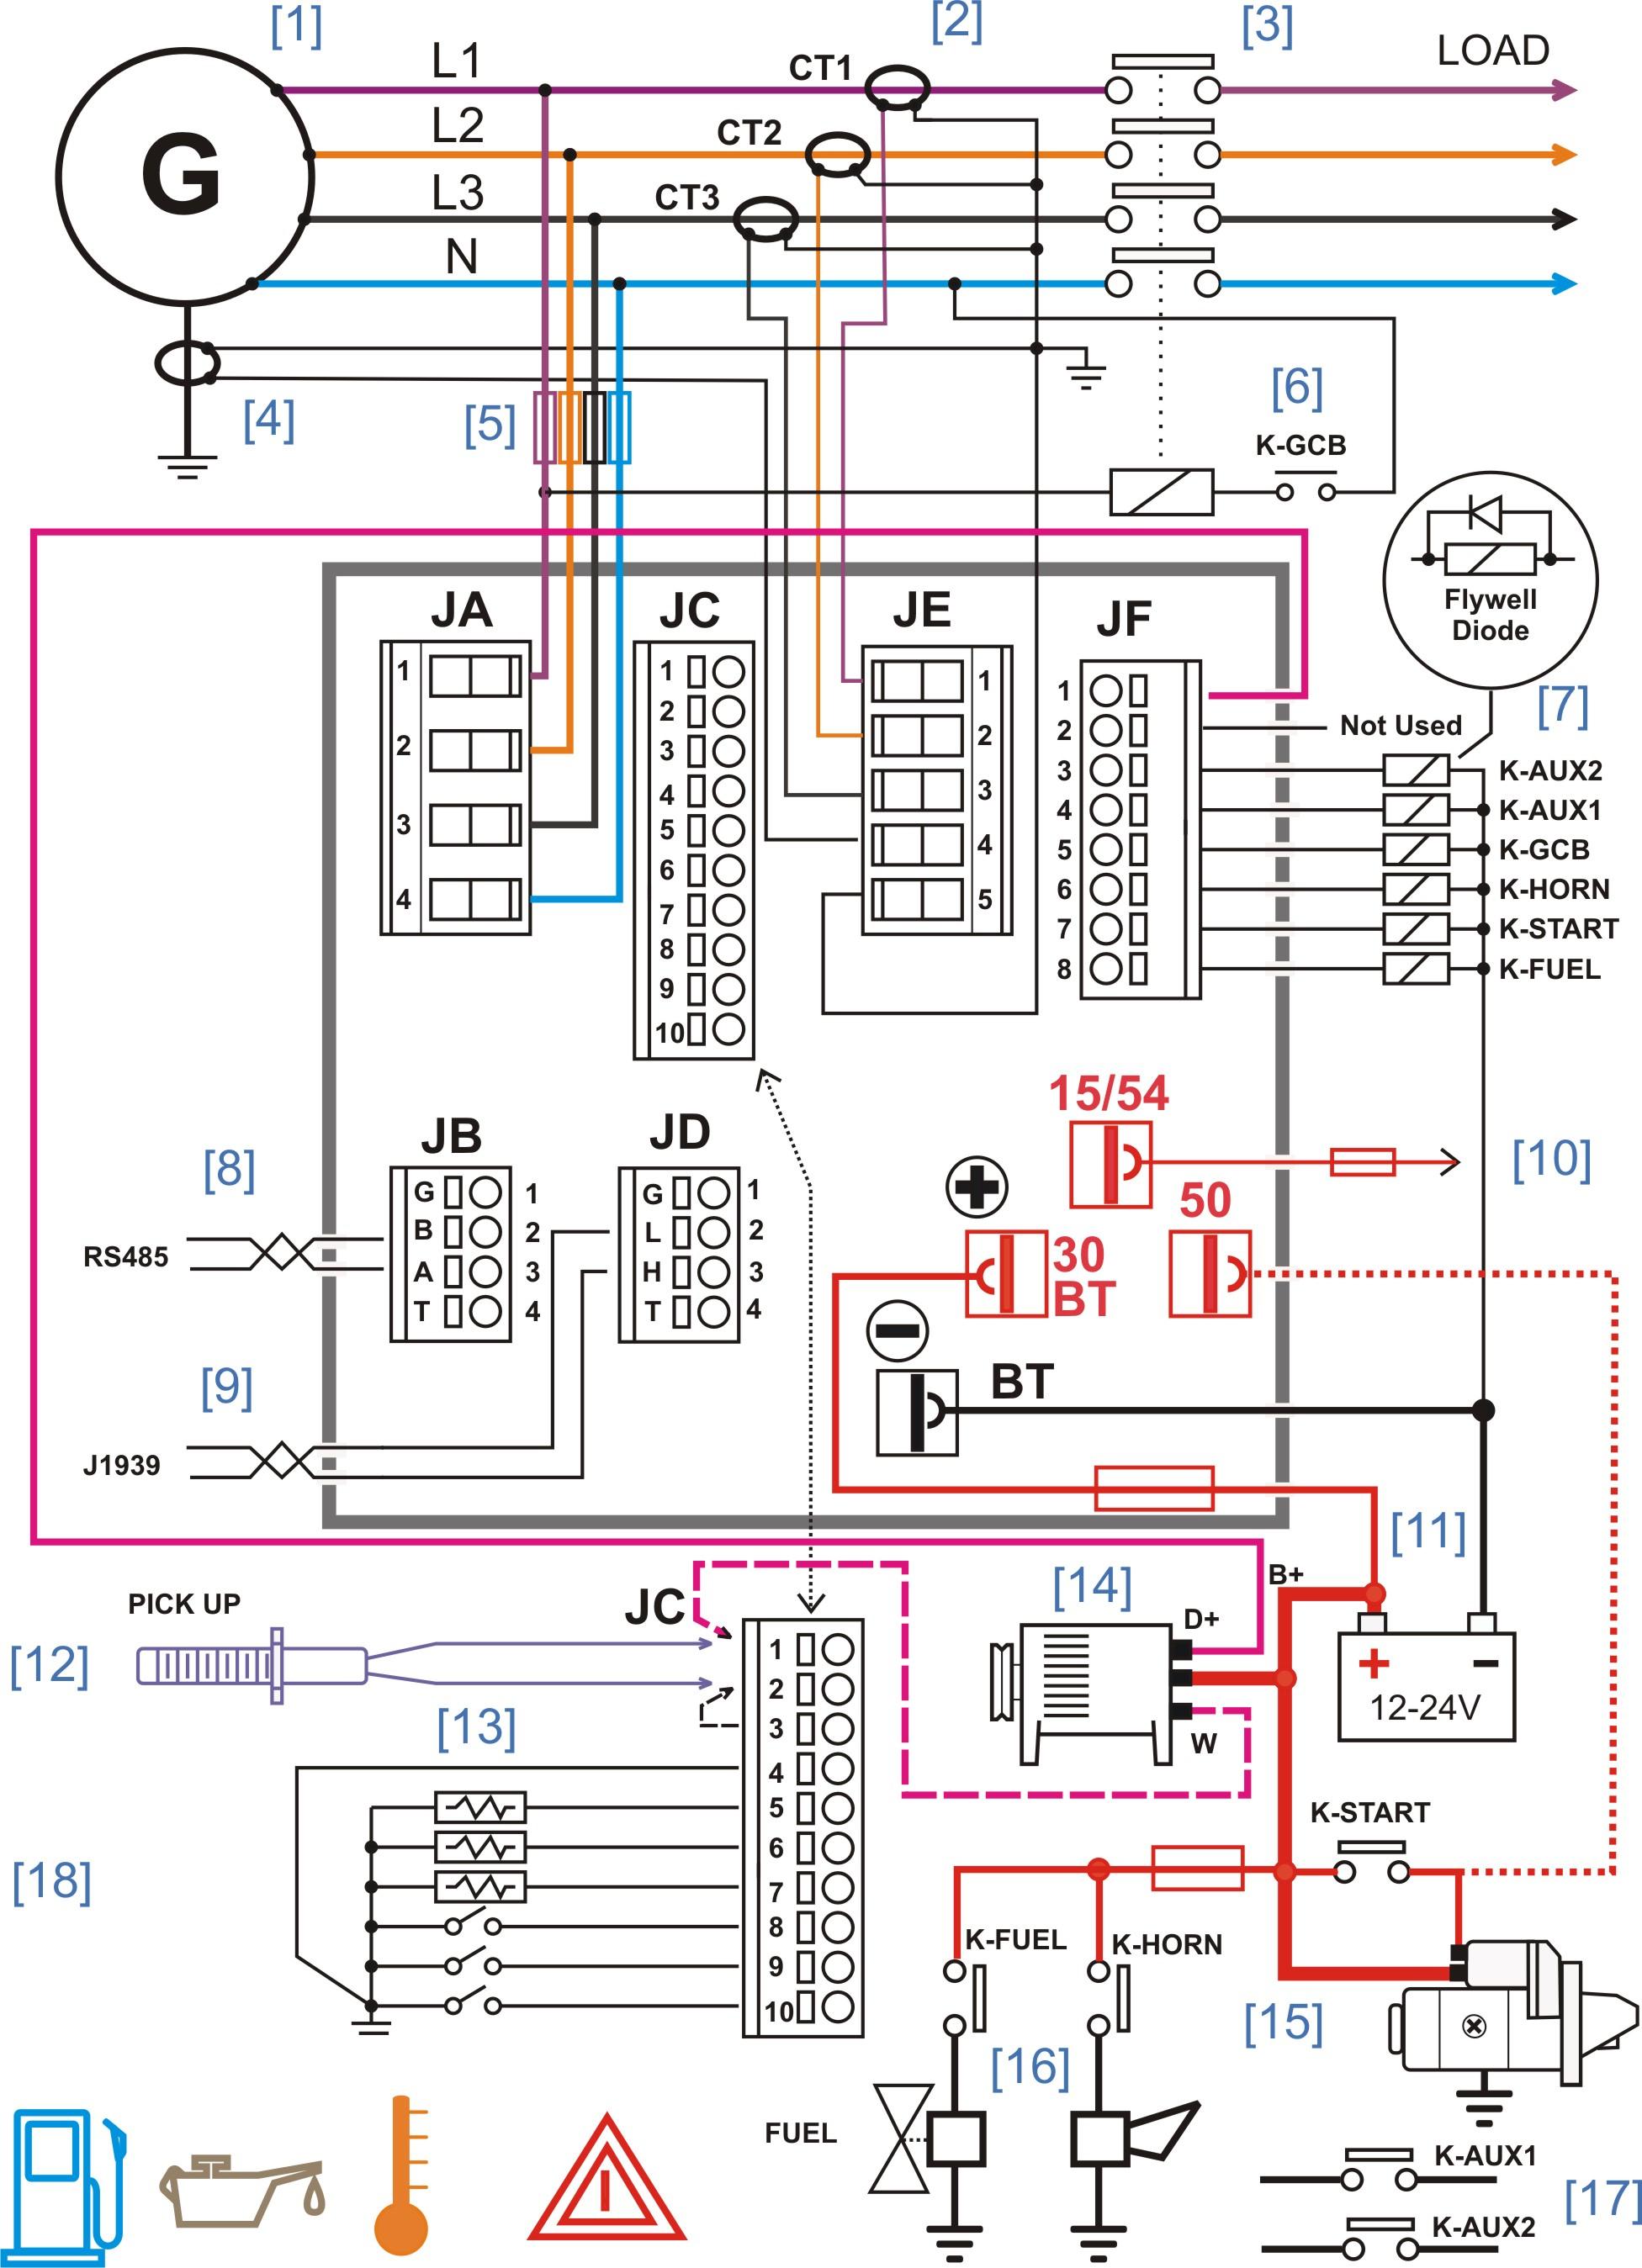 Wiring Diagram Maker | Wiring Diagram - Home Wiring Diagram Software